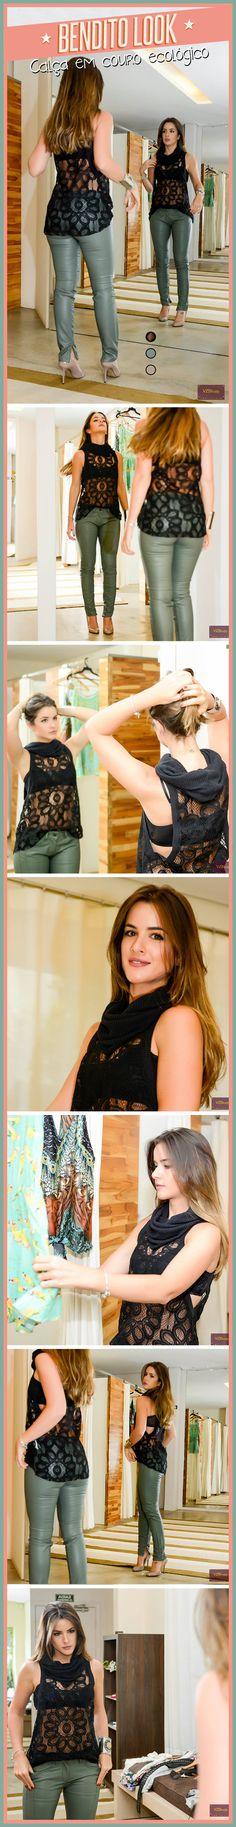 Calça couro ecológico - Bendito Look #benditainspiracao #benditolook #look #moda #calça #couro #ecológico